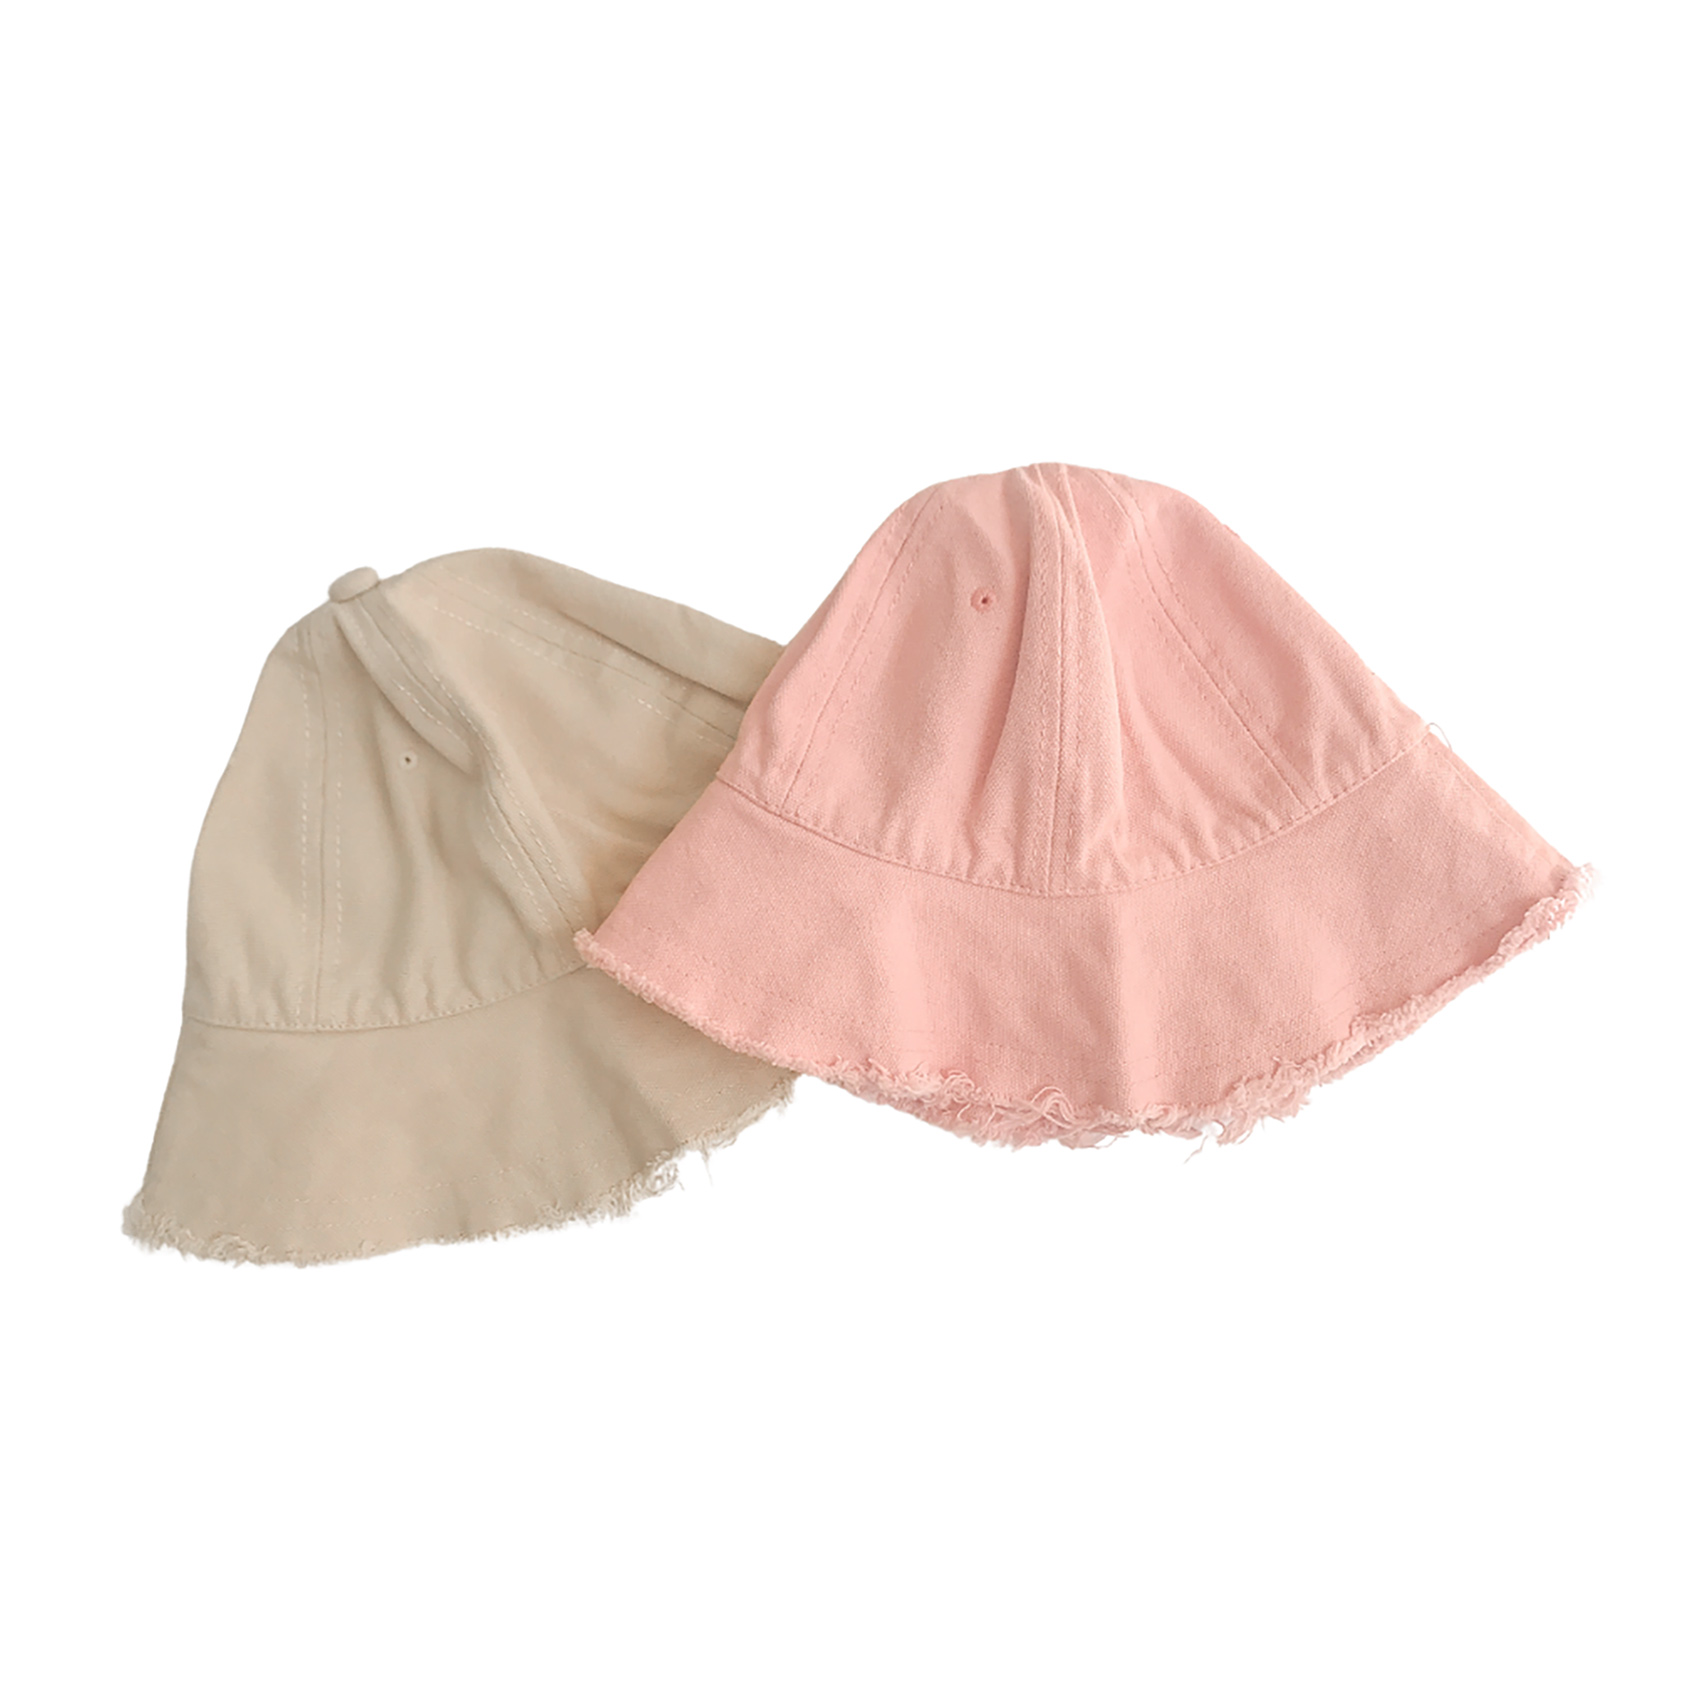 Sonny Canvas Hats Sand Pink Sundae